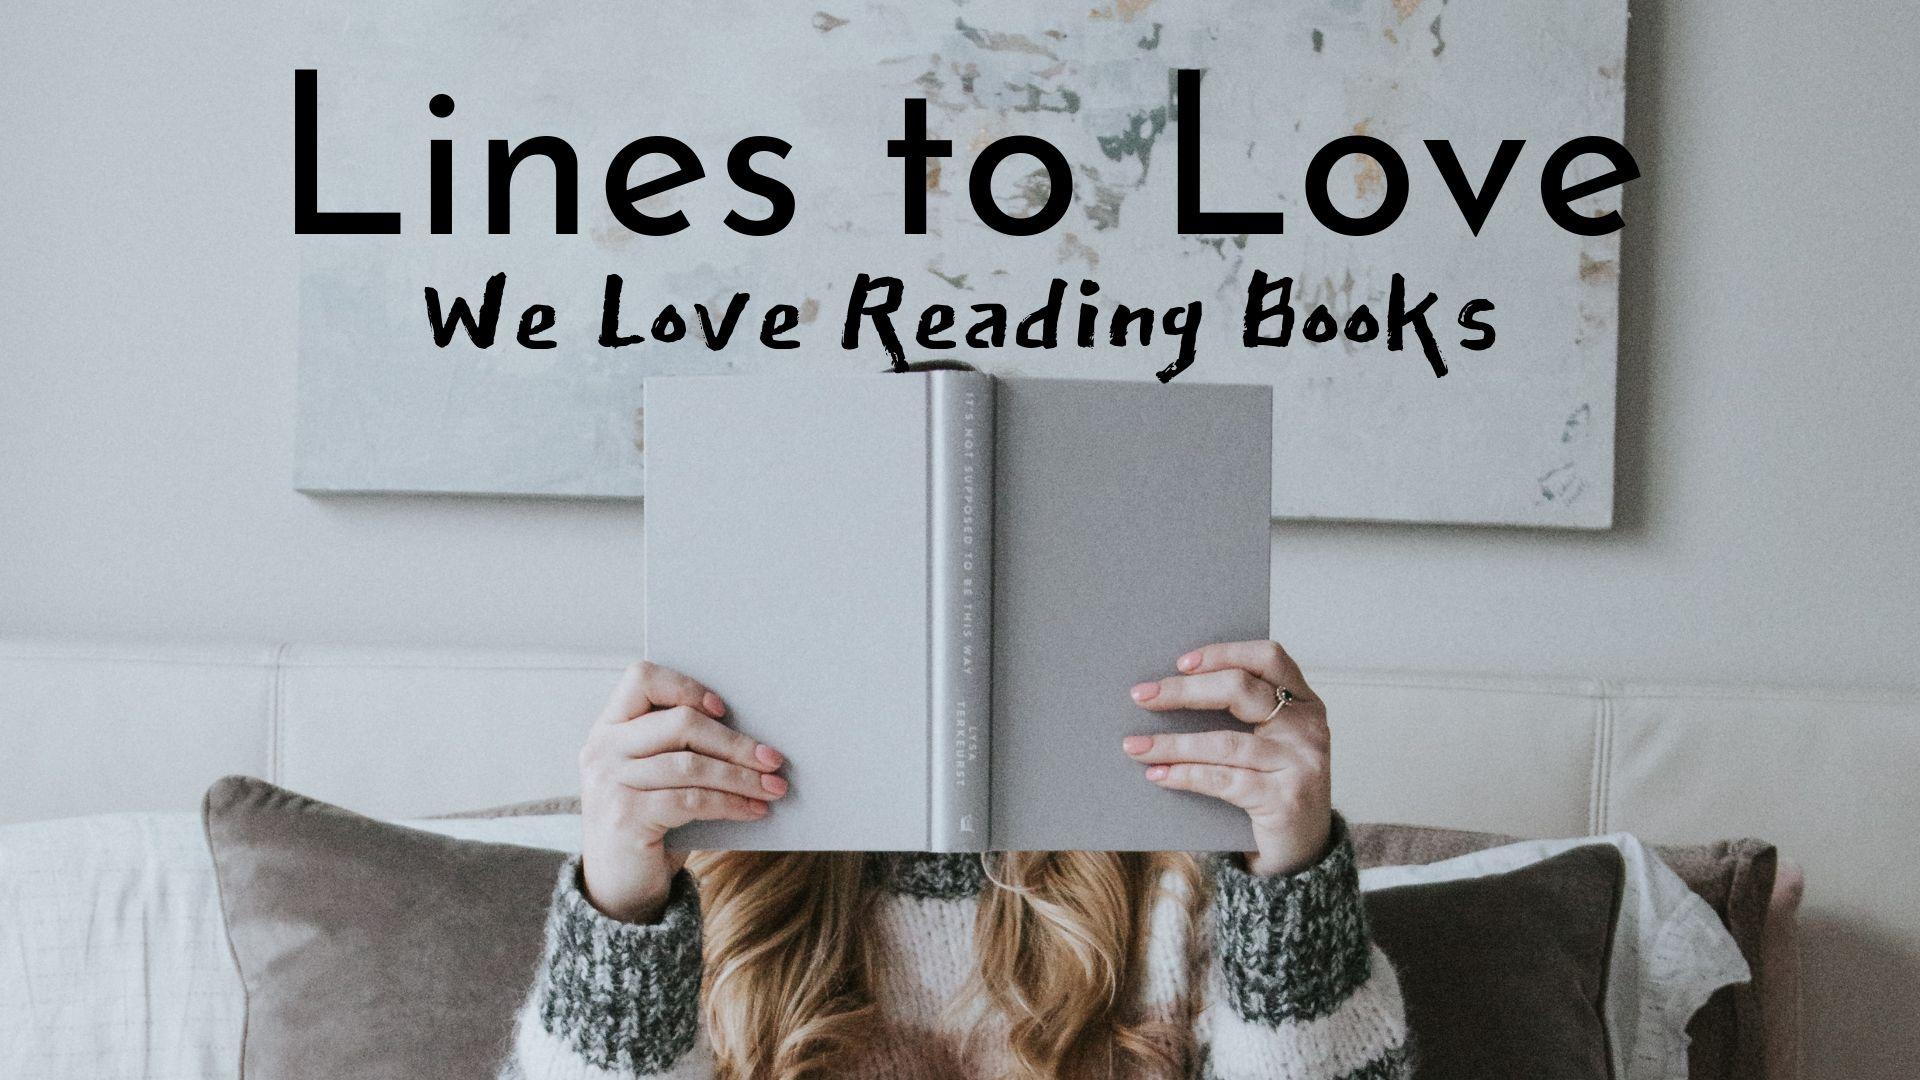 banner-lines-to-love-we-love-reading-books-01.jpg